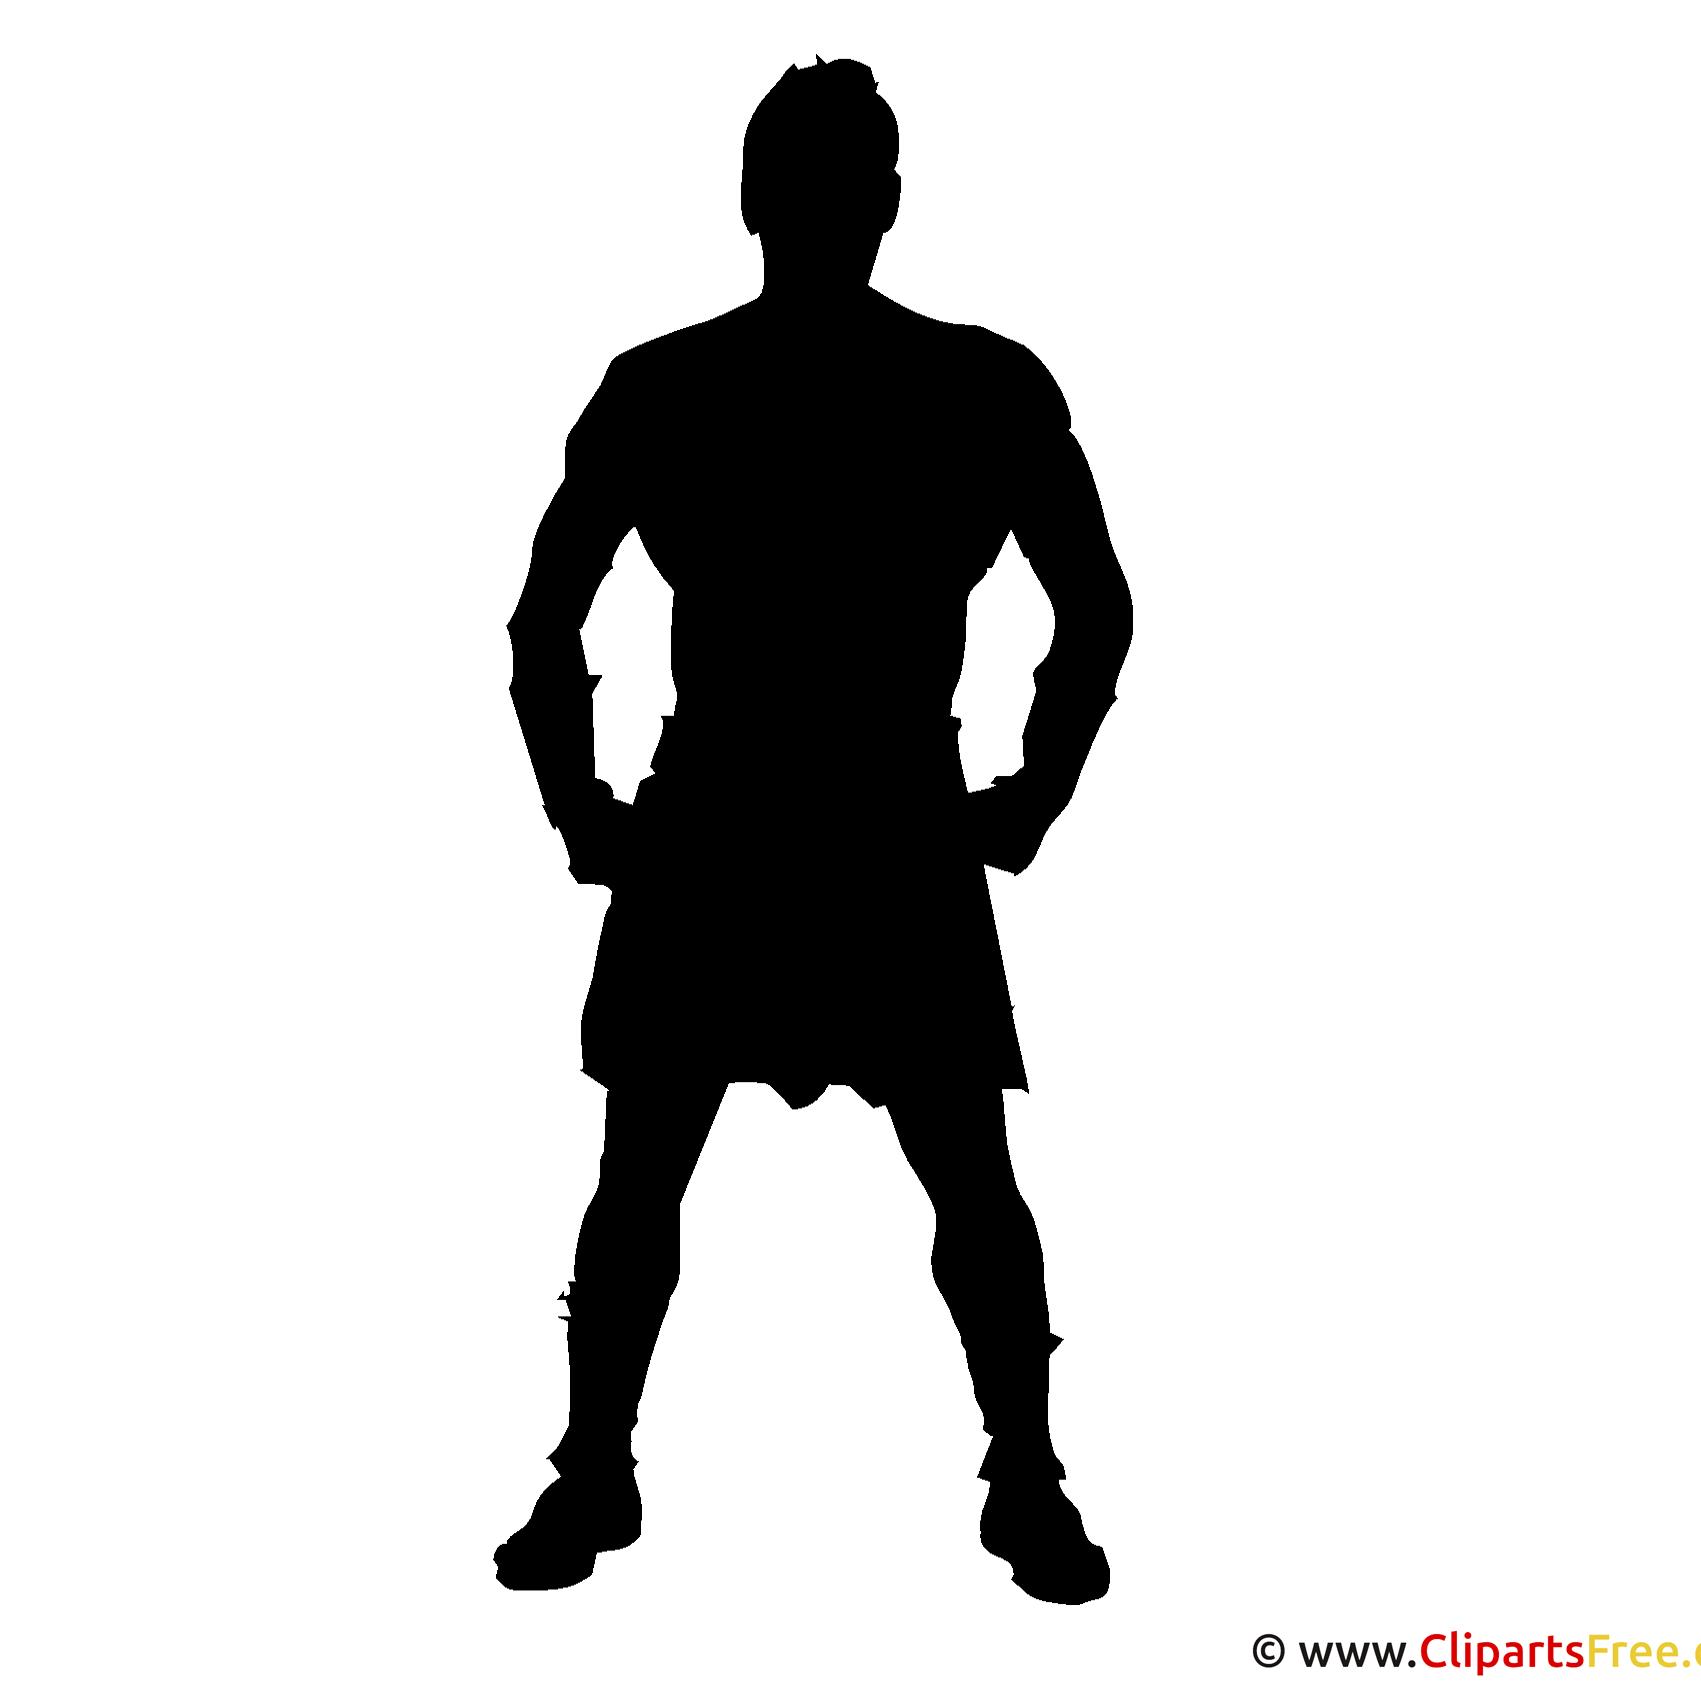 Silhouette Athlete Clipart